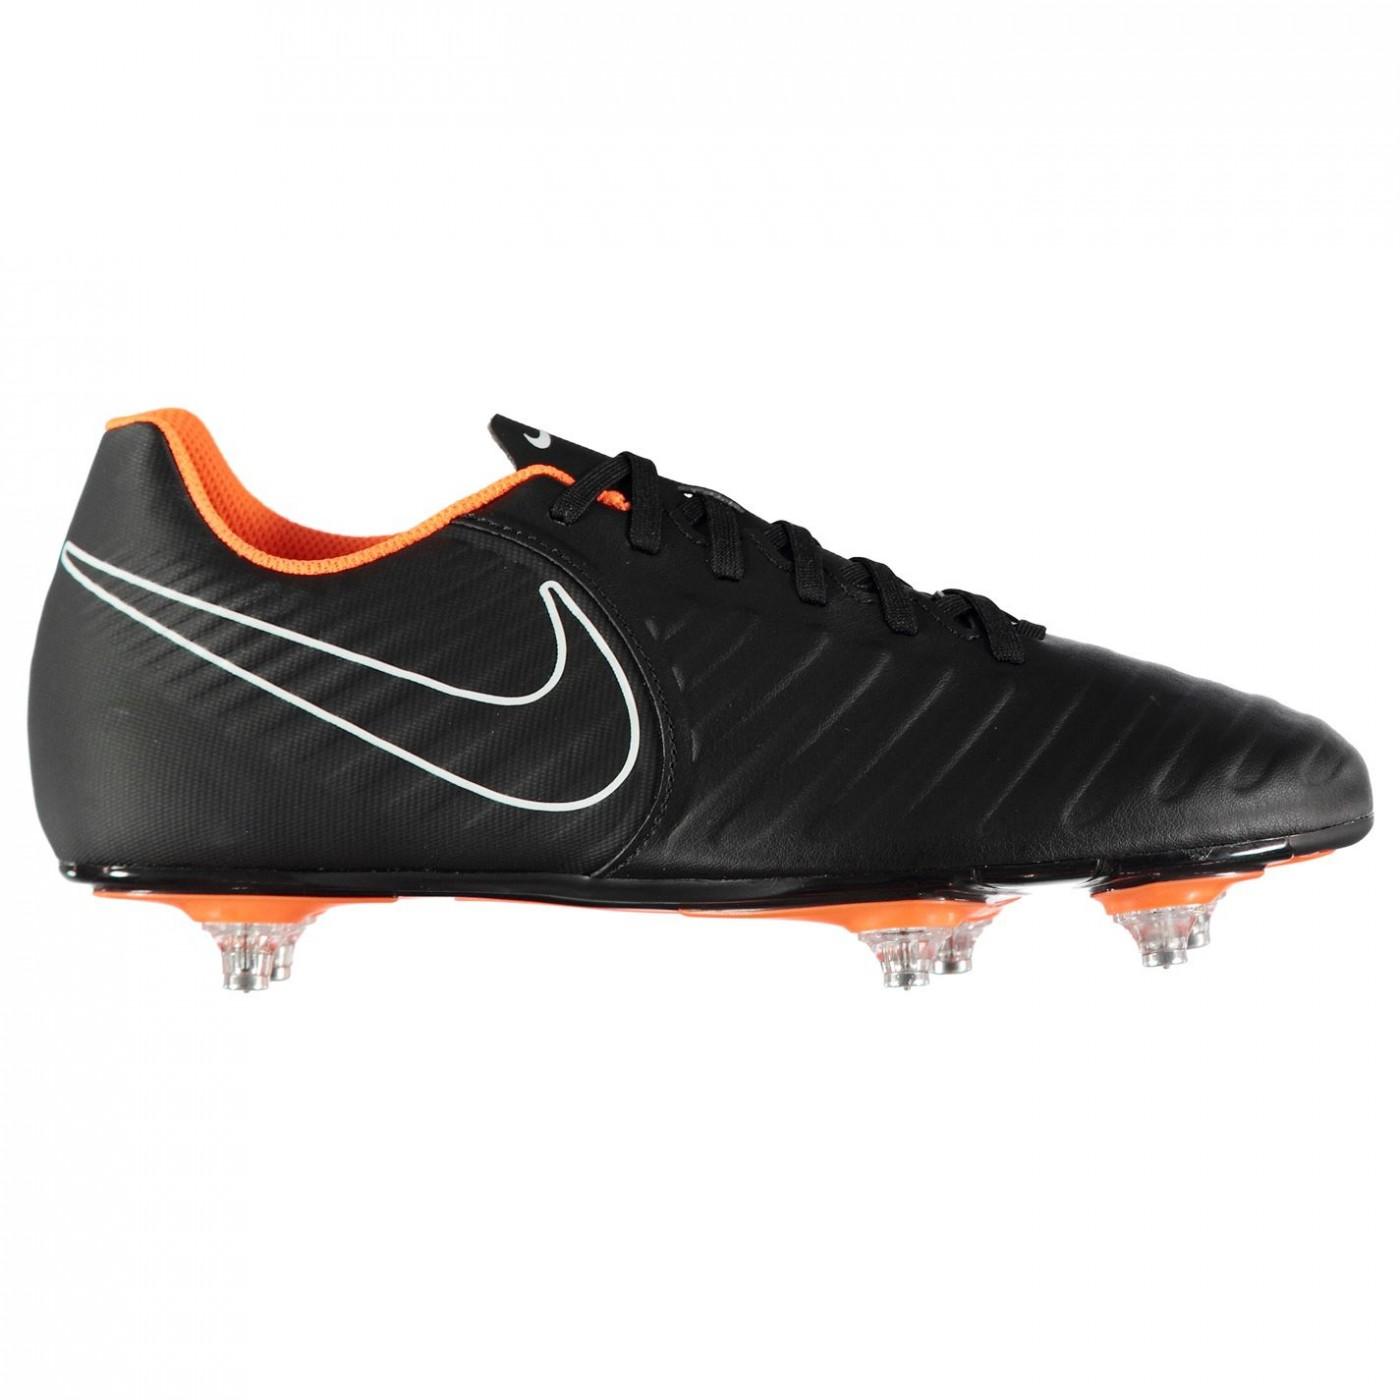 c106d2501b891 reduced nike tiempo legend mens sg football boots c3785 429c2